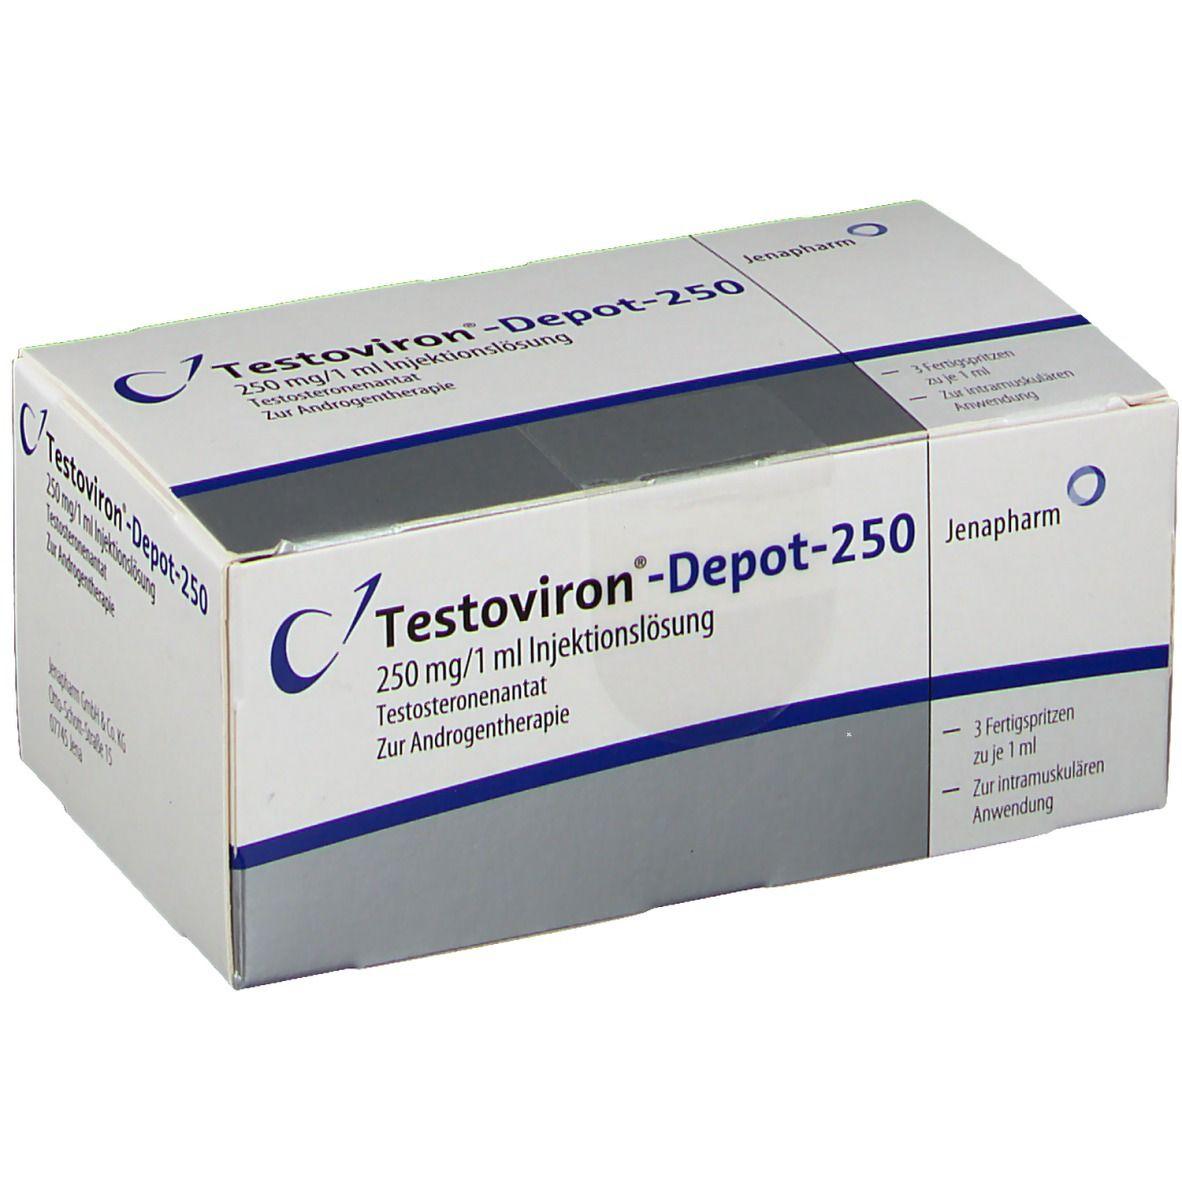 Testoviron-e 300 mg hcl